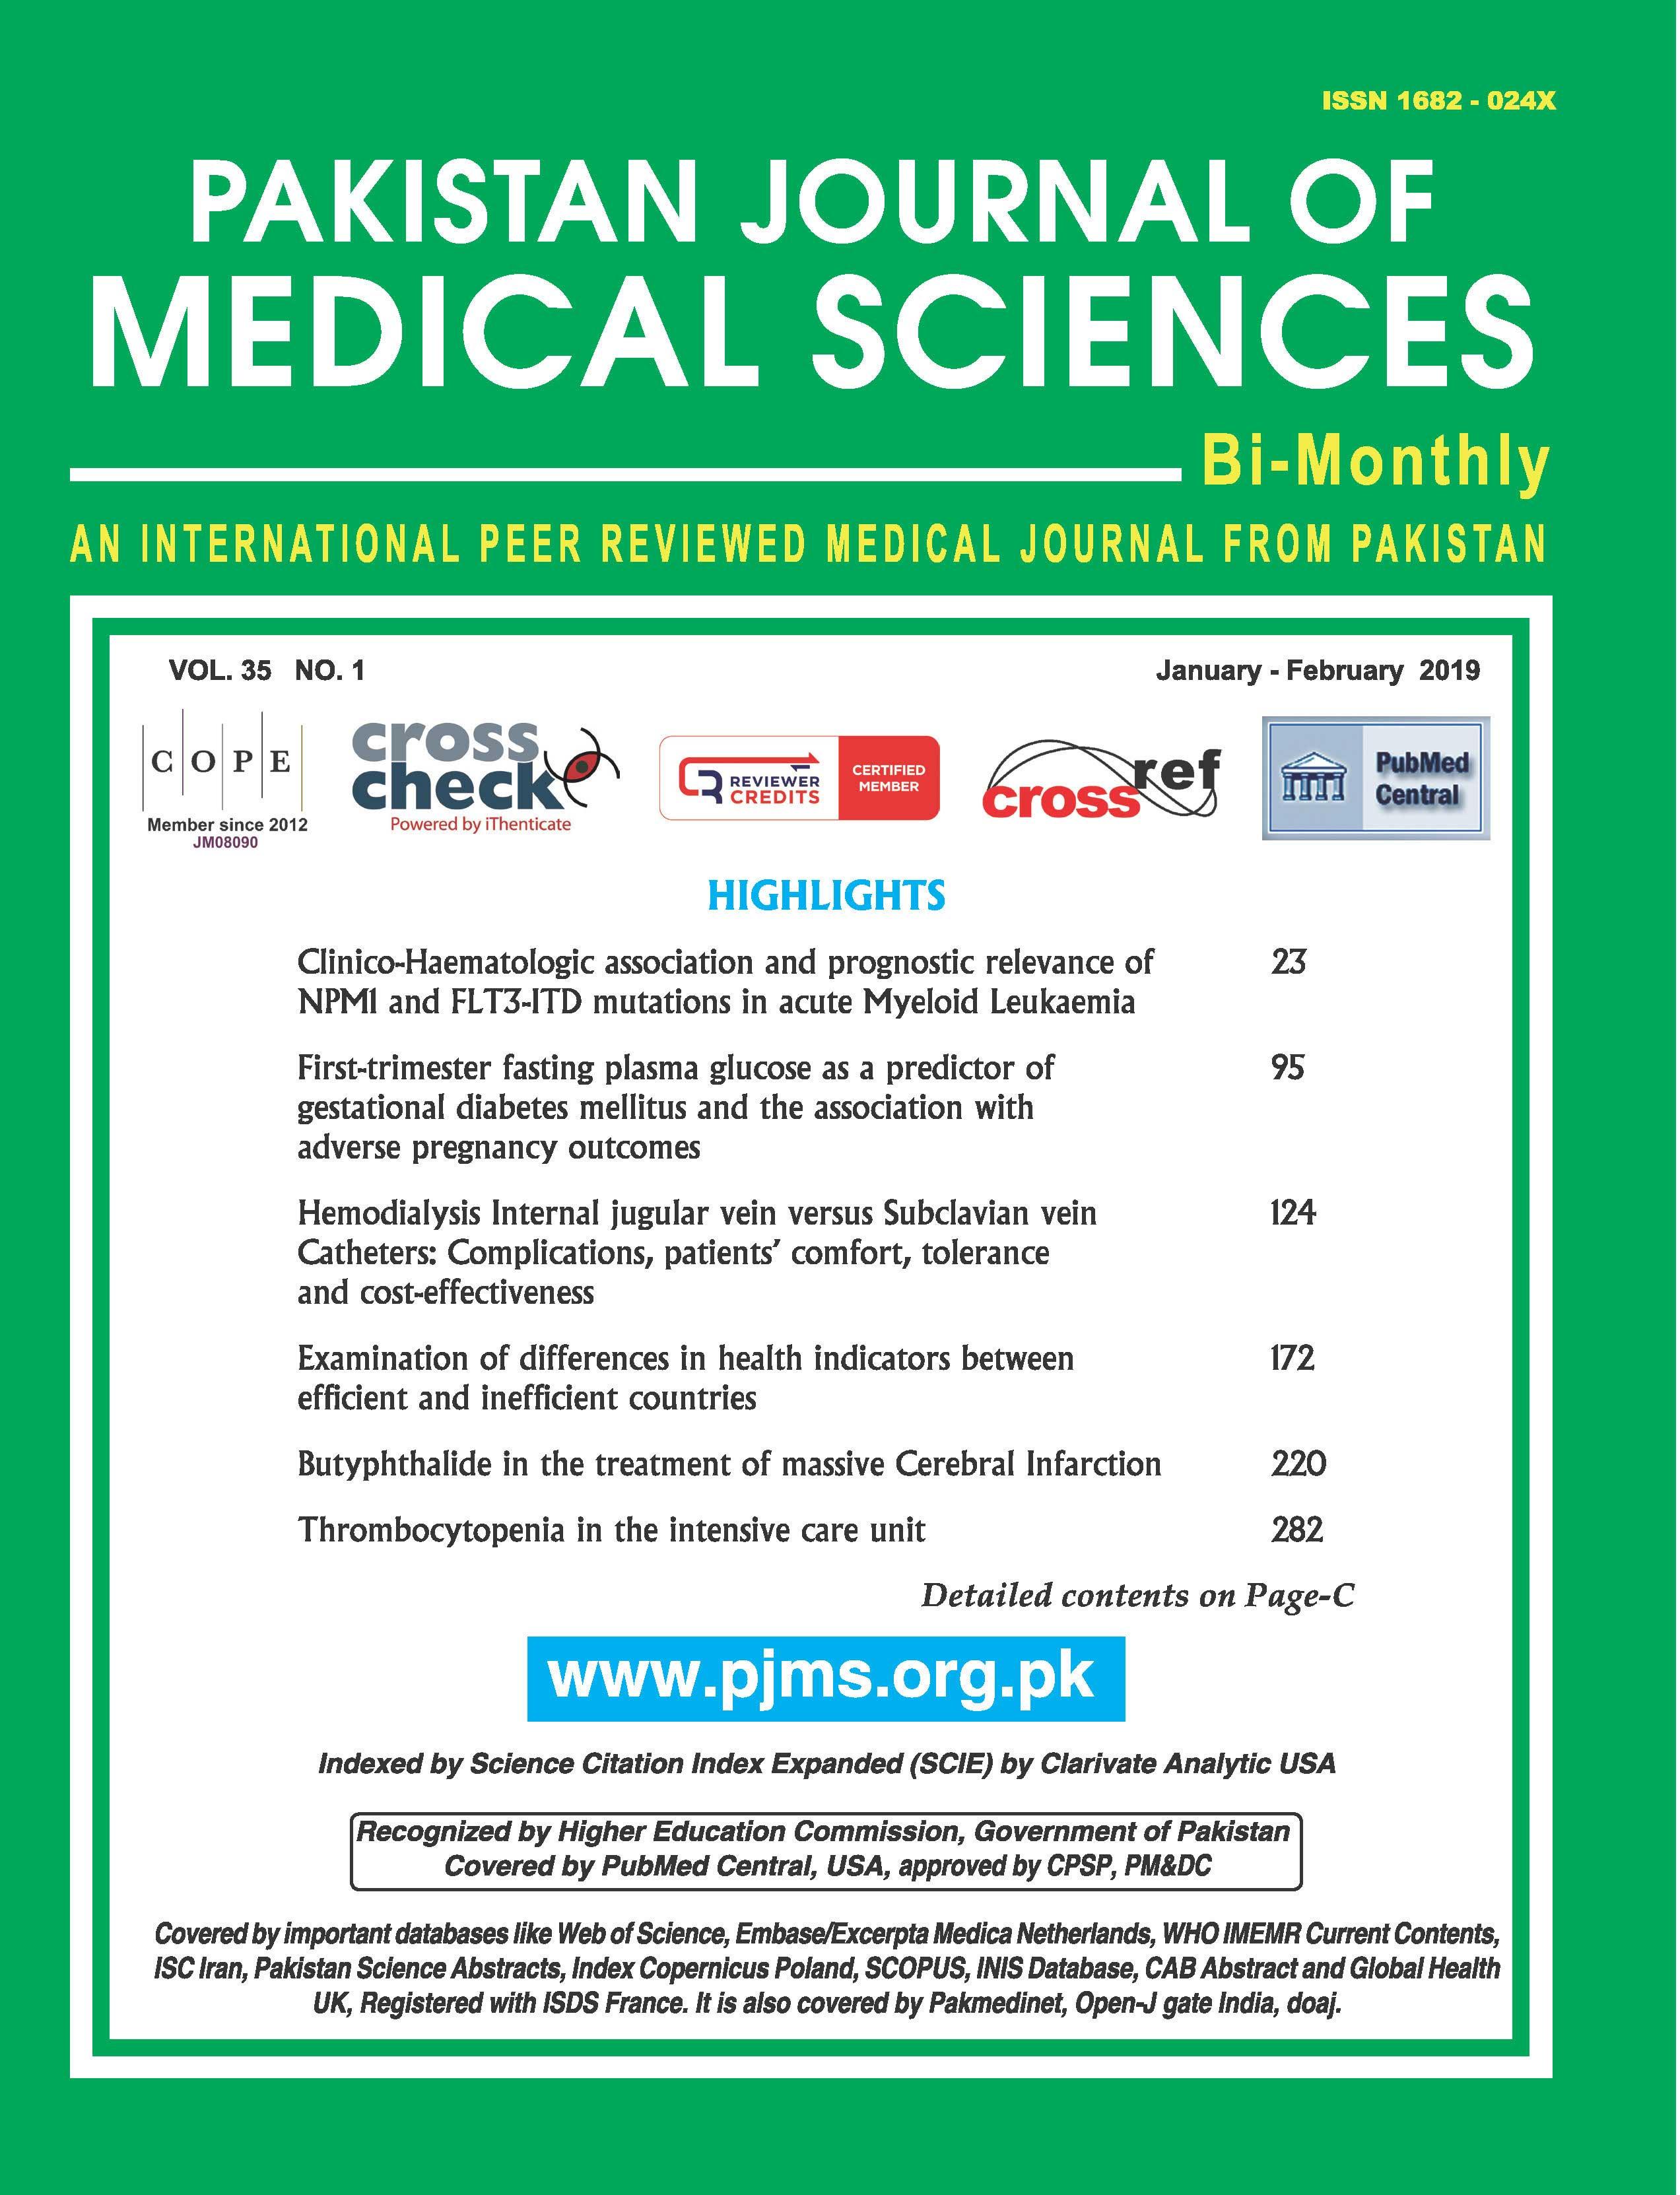 PJMS 2019 Vol. 35 Issue 1